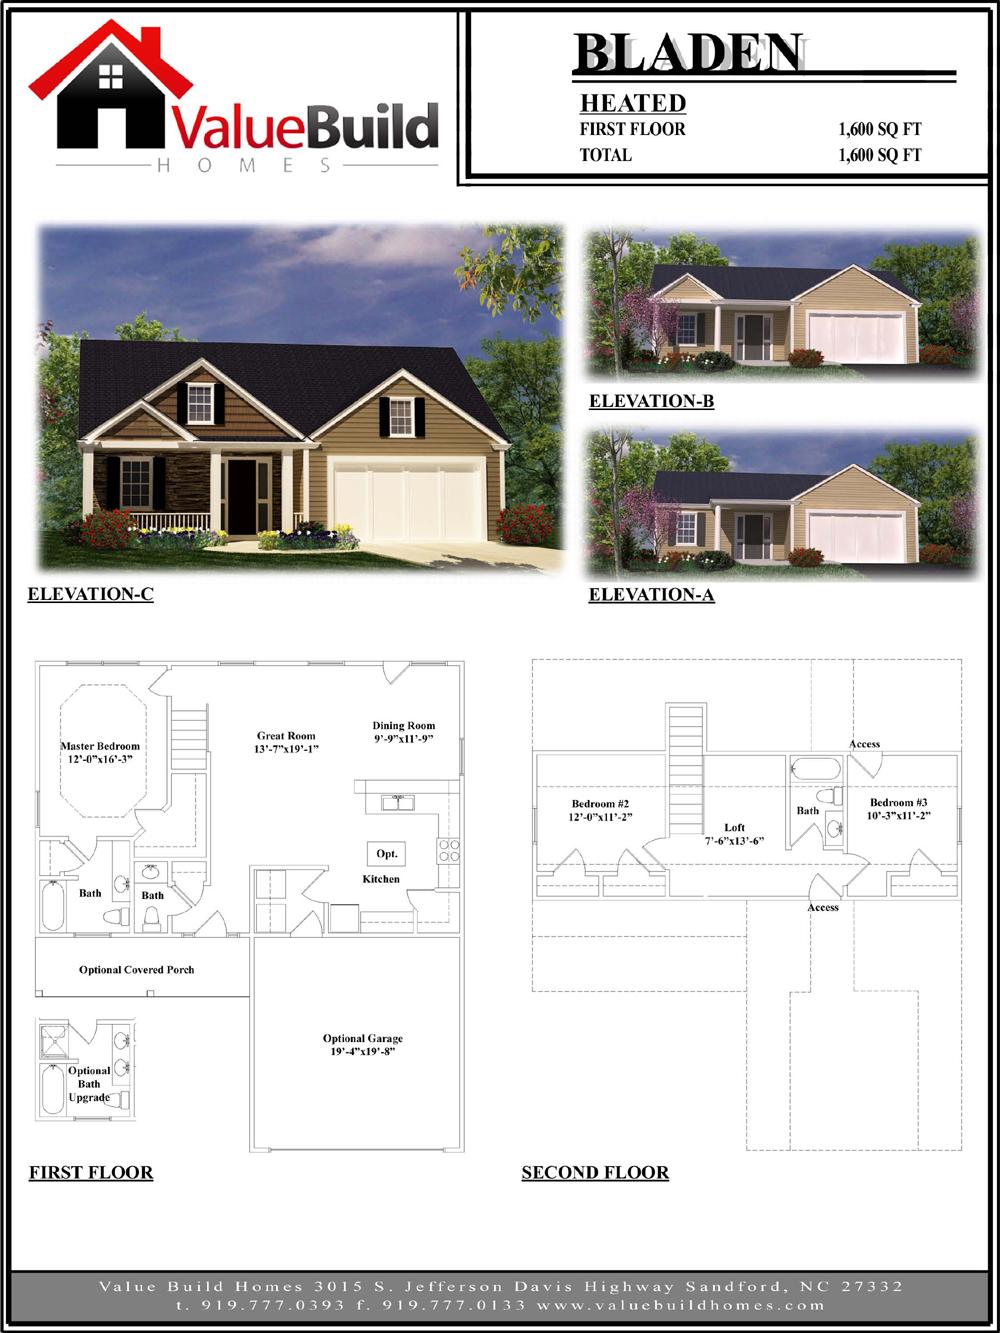 bladen house plan custom floor plans by value build homes bladen house plan custom floor plans by value build homes